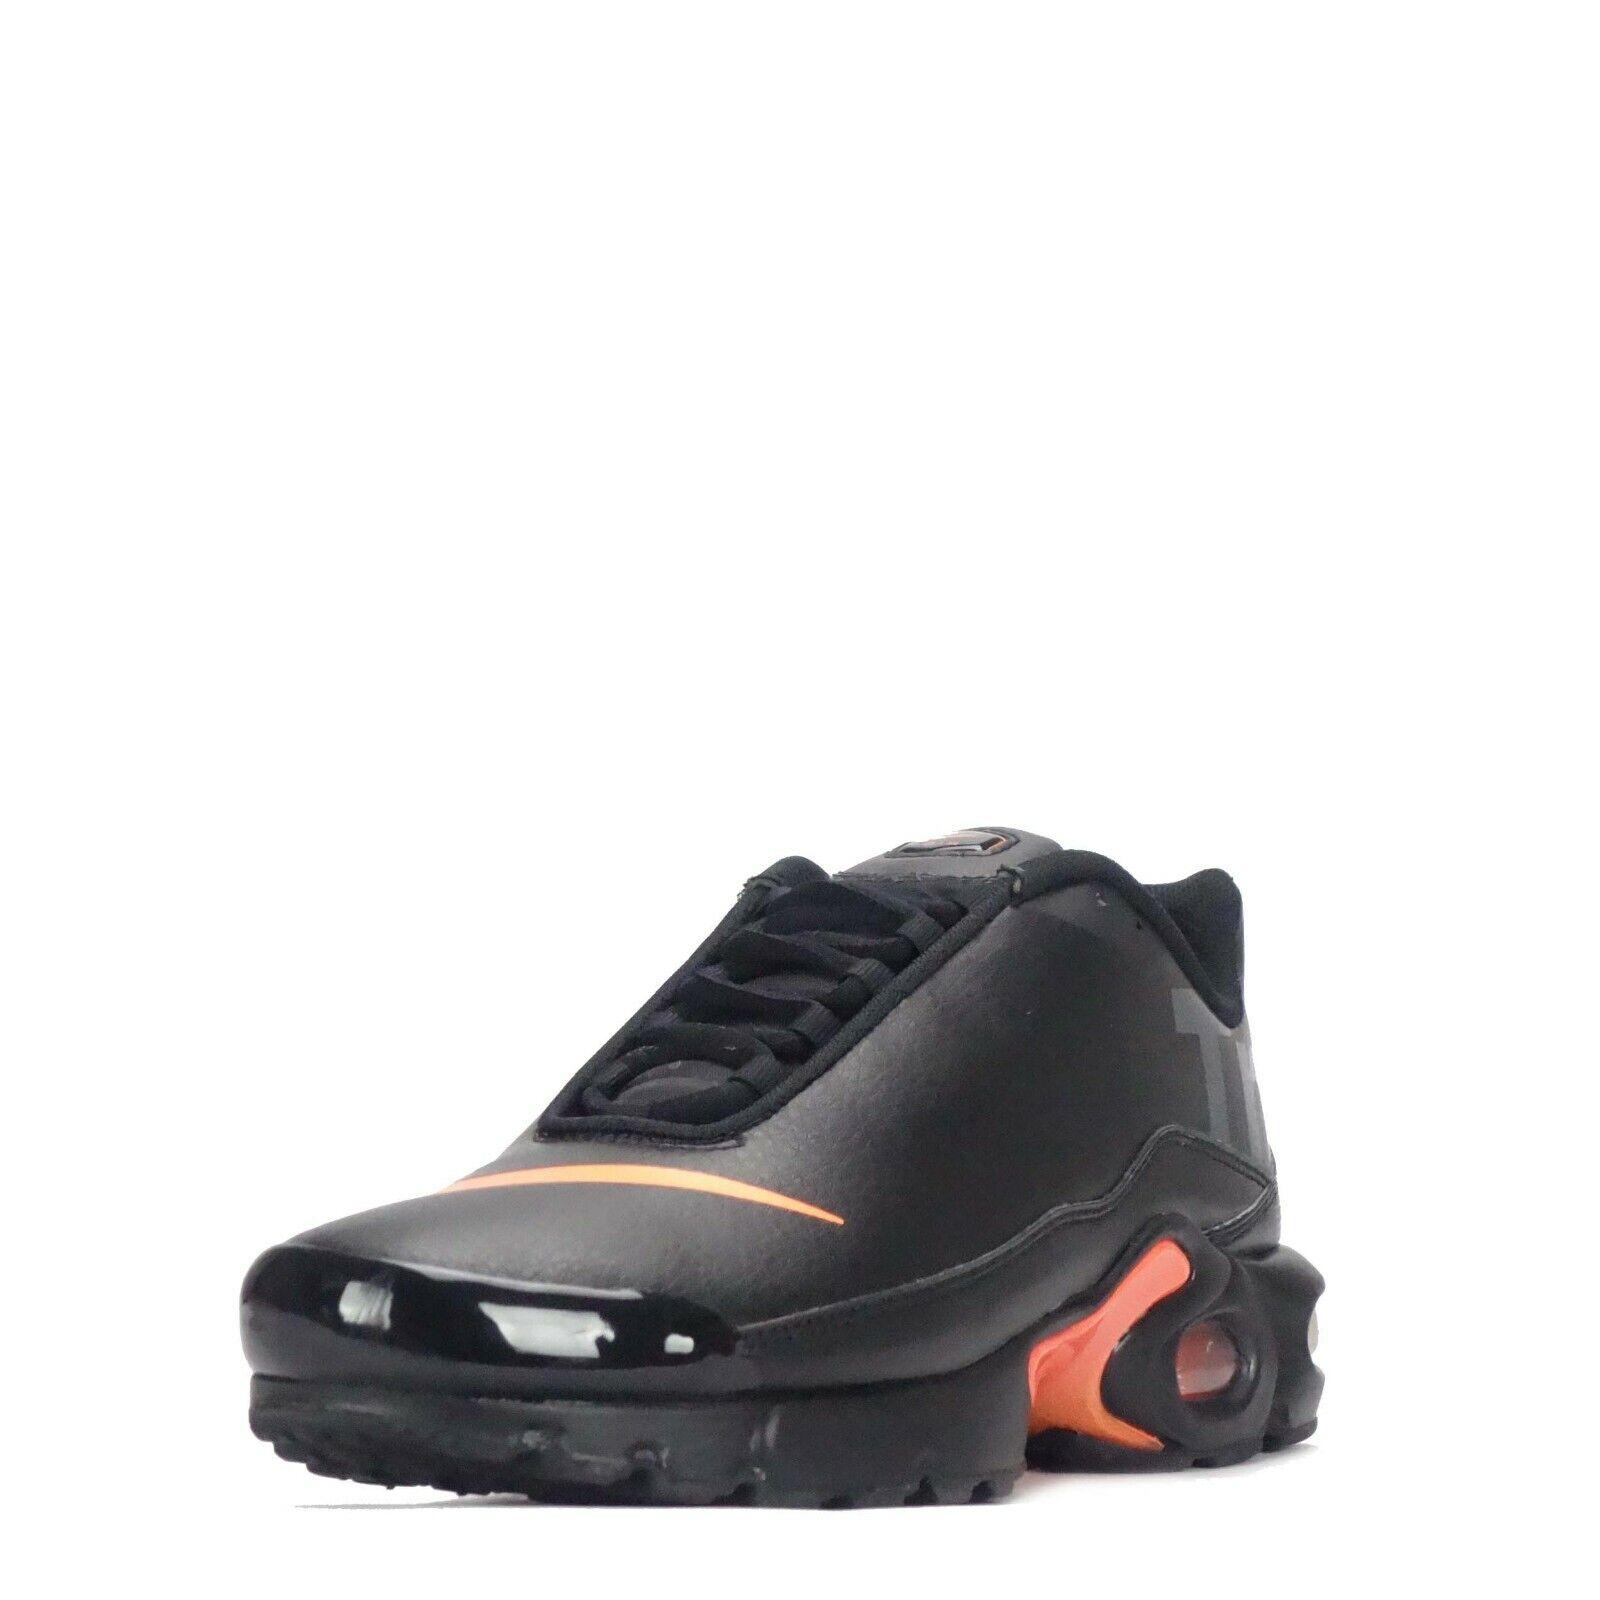 Nike Air Max Plus TN SE Junior Leather